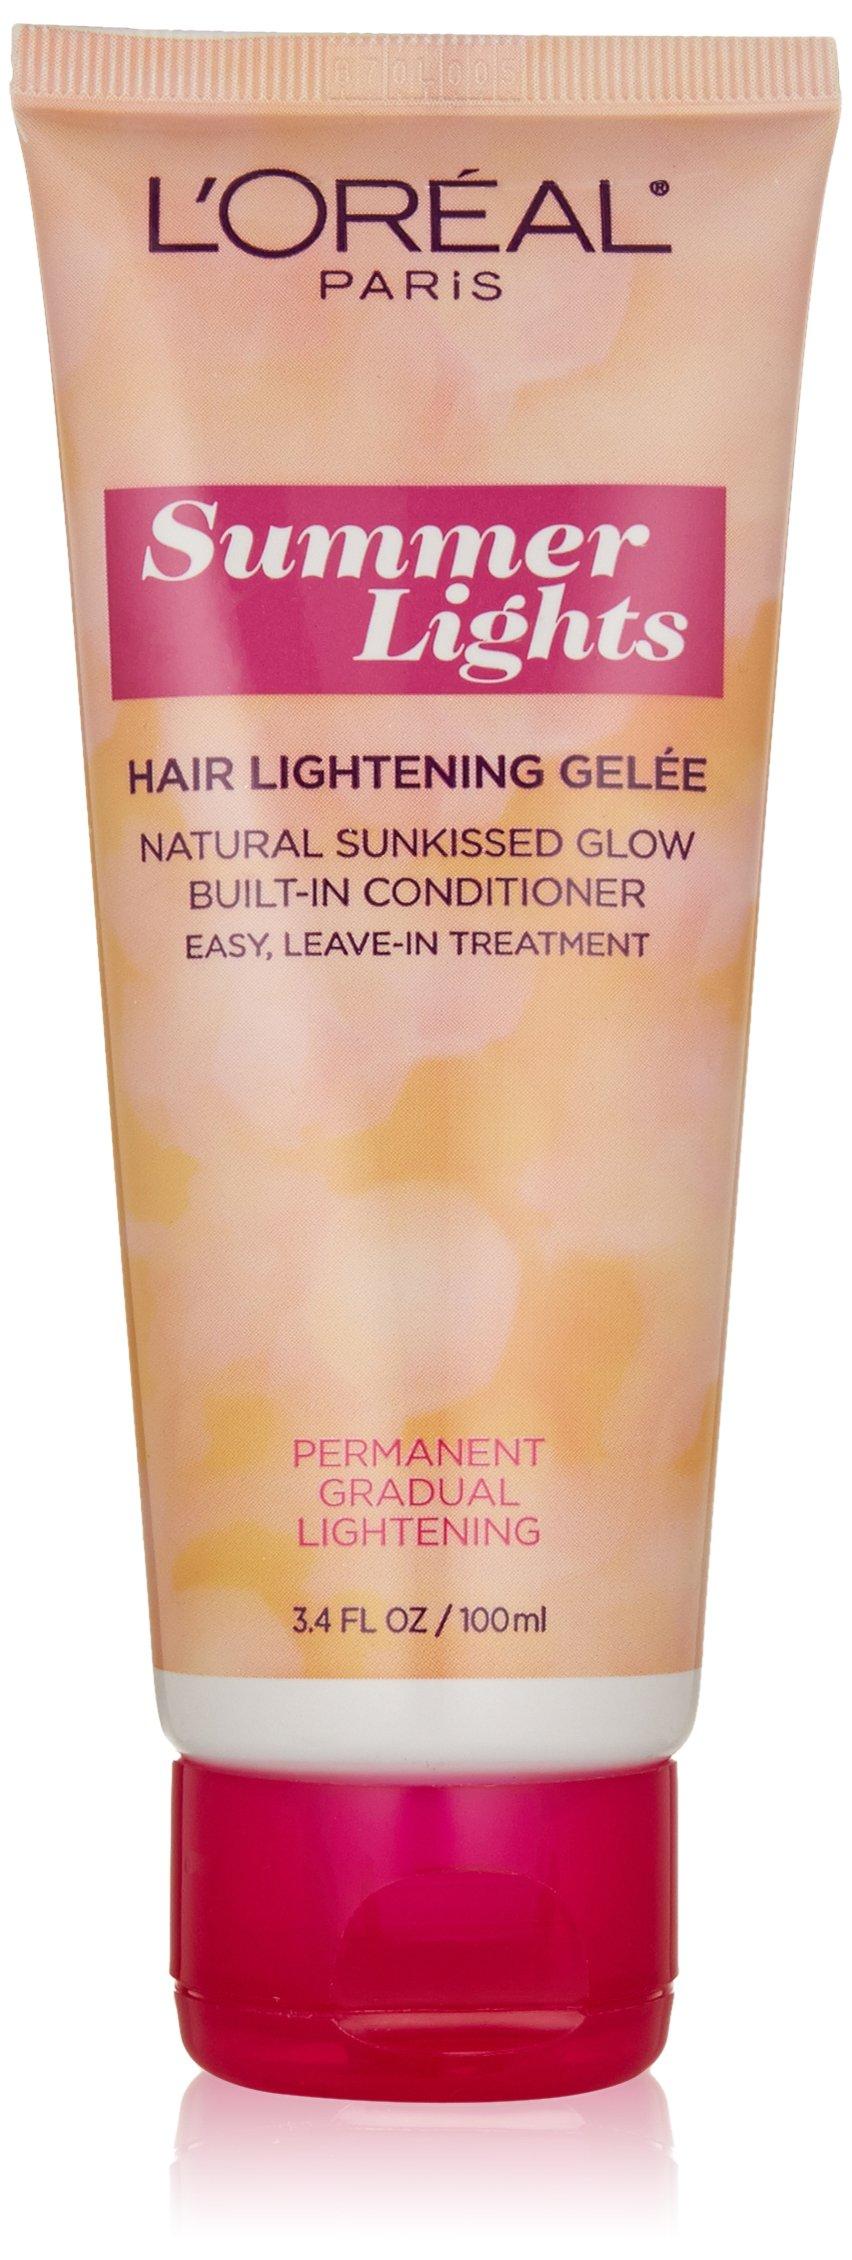 L'Oreal Paris Summer Lights Hair Lightening Gelee, Light Blonde to Dark Blo